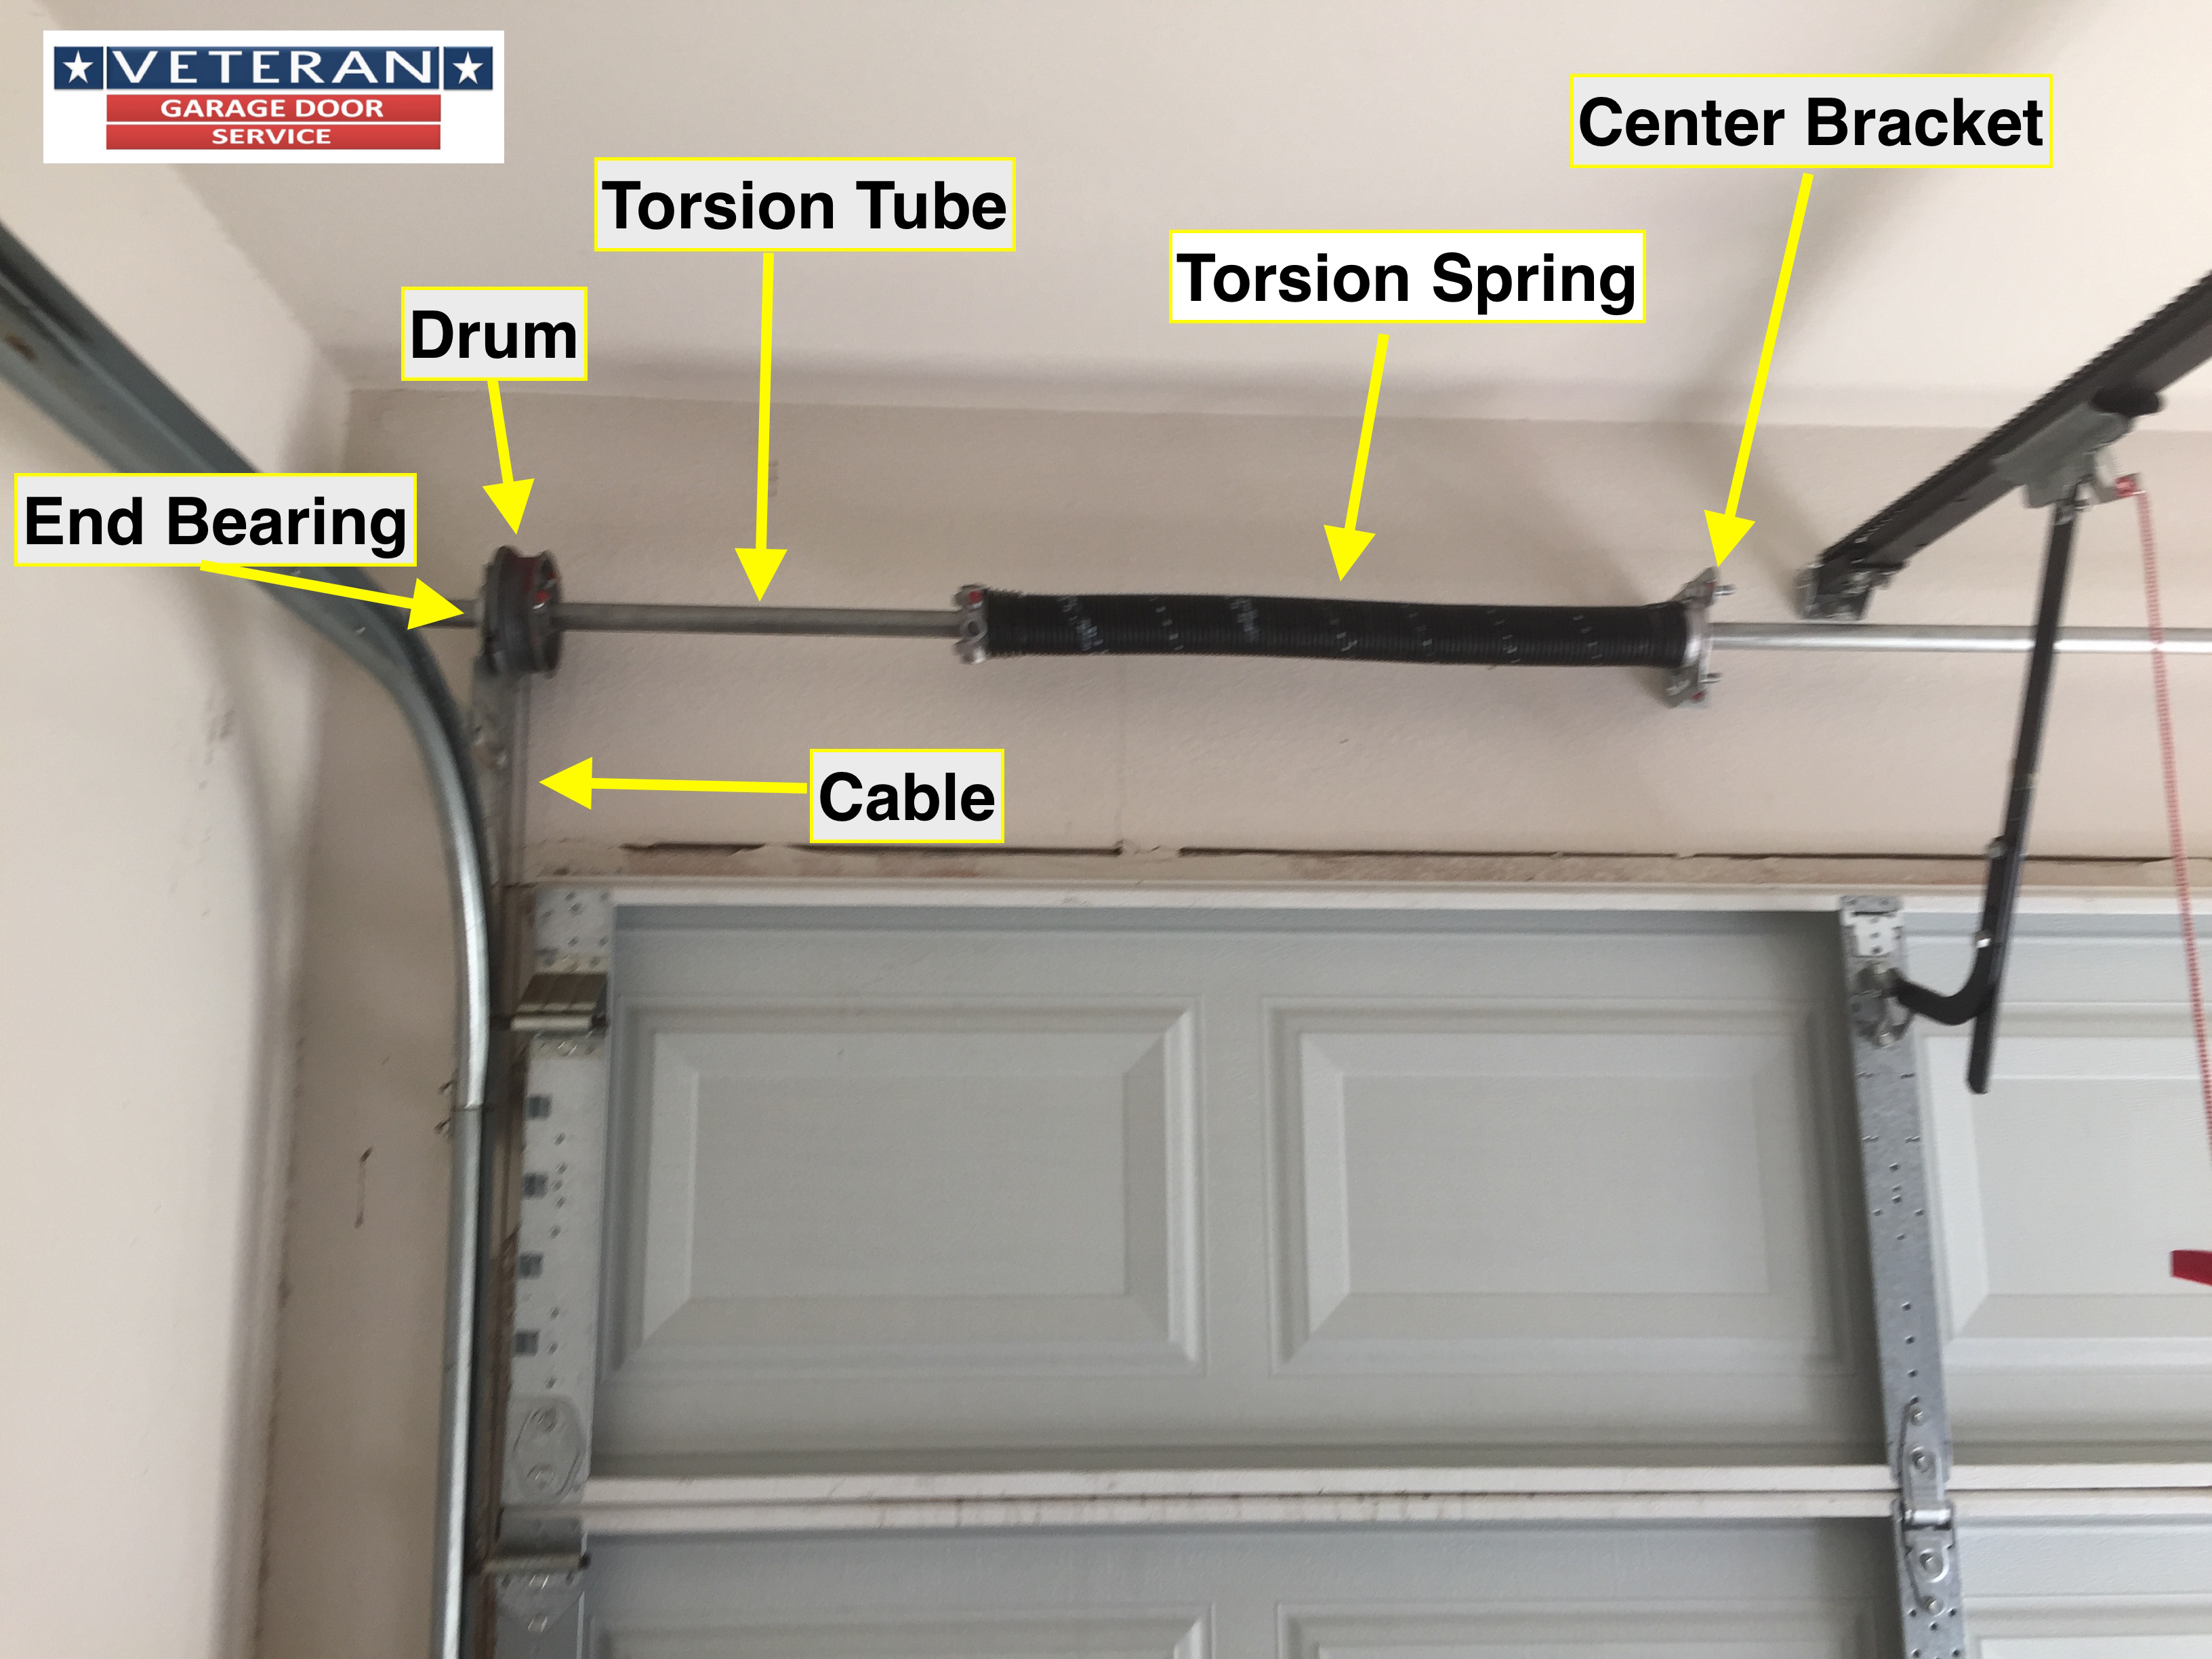 Should I Have 1 Or 2 Torsion Springs On My Garage Door in size 3264 X 2448